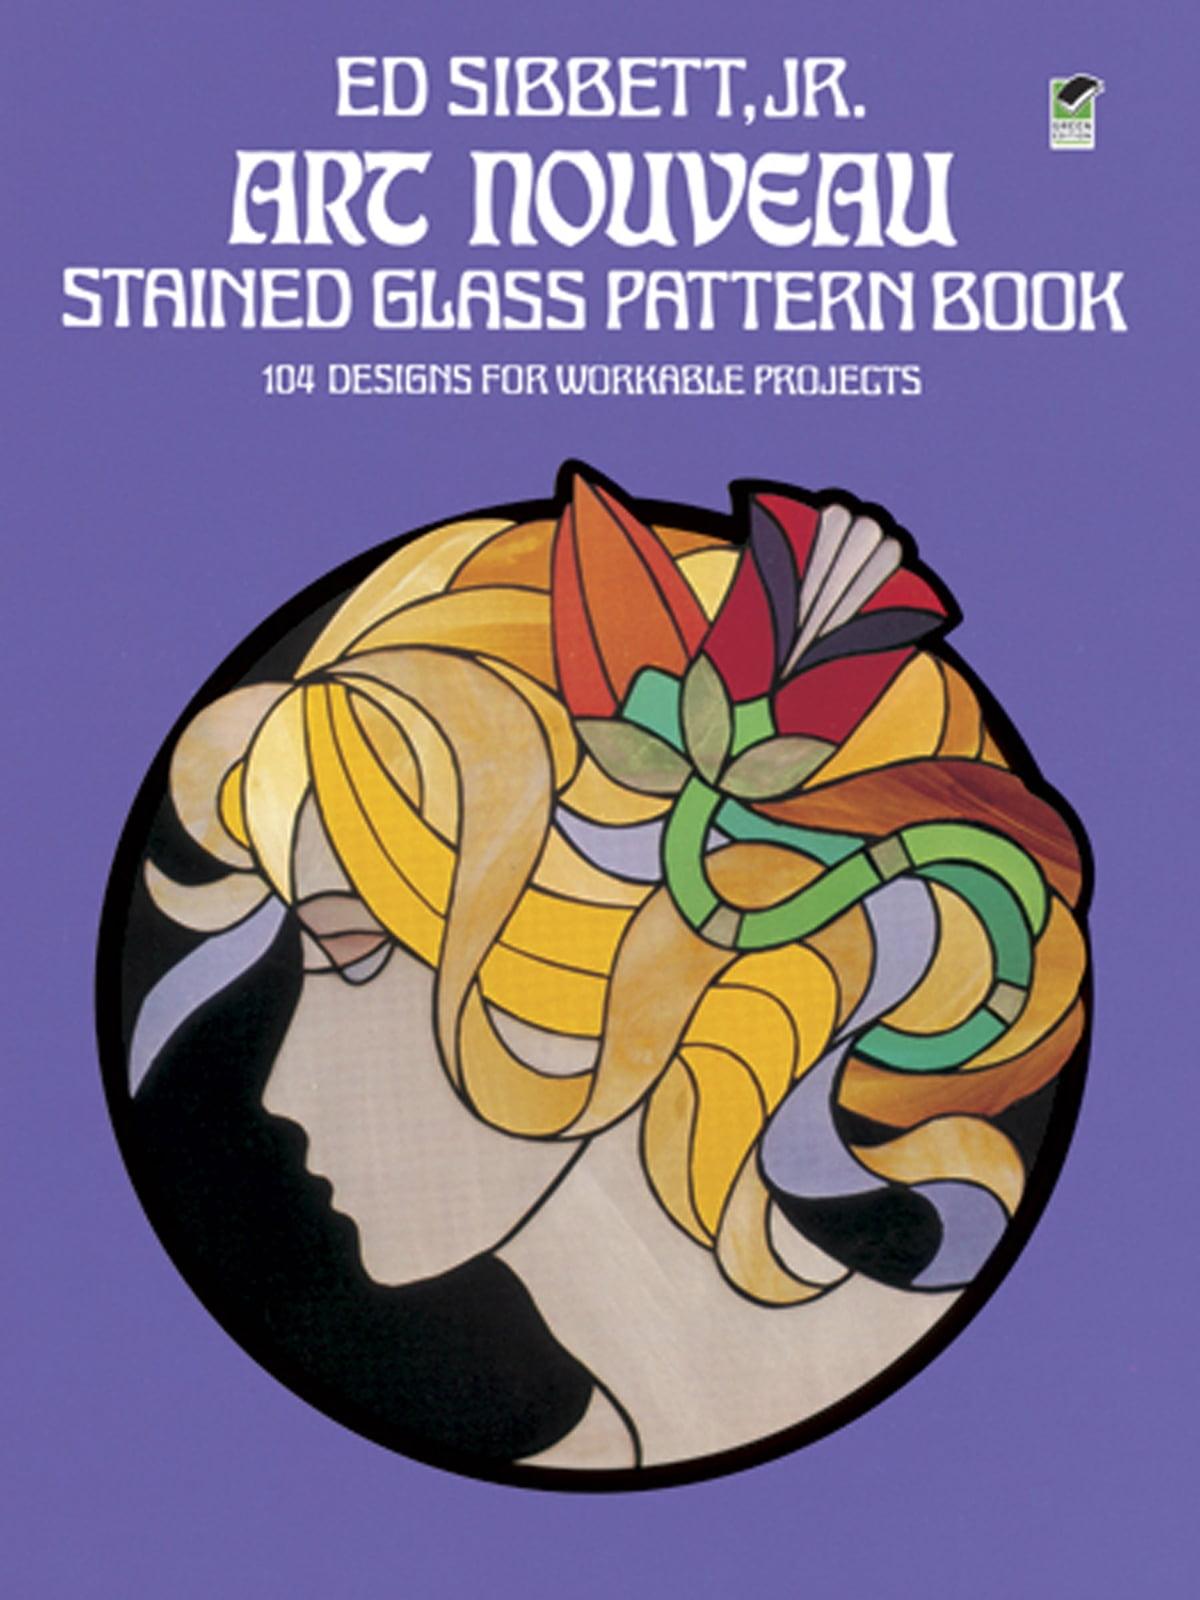 Art Nouveau Stained Glass Pattern Book Ebook By Ed Sibbett Jr 9780486141008 Rakuten Kobo United States